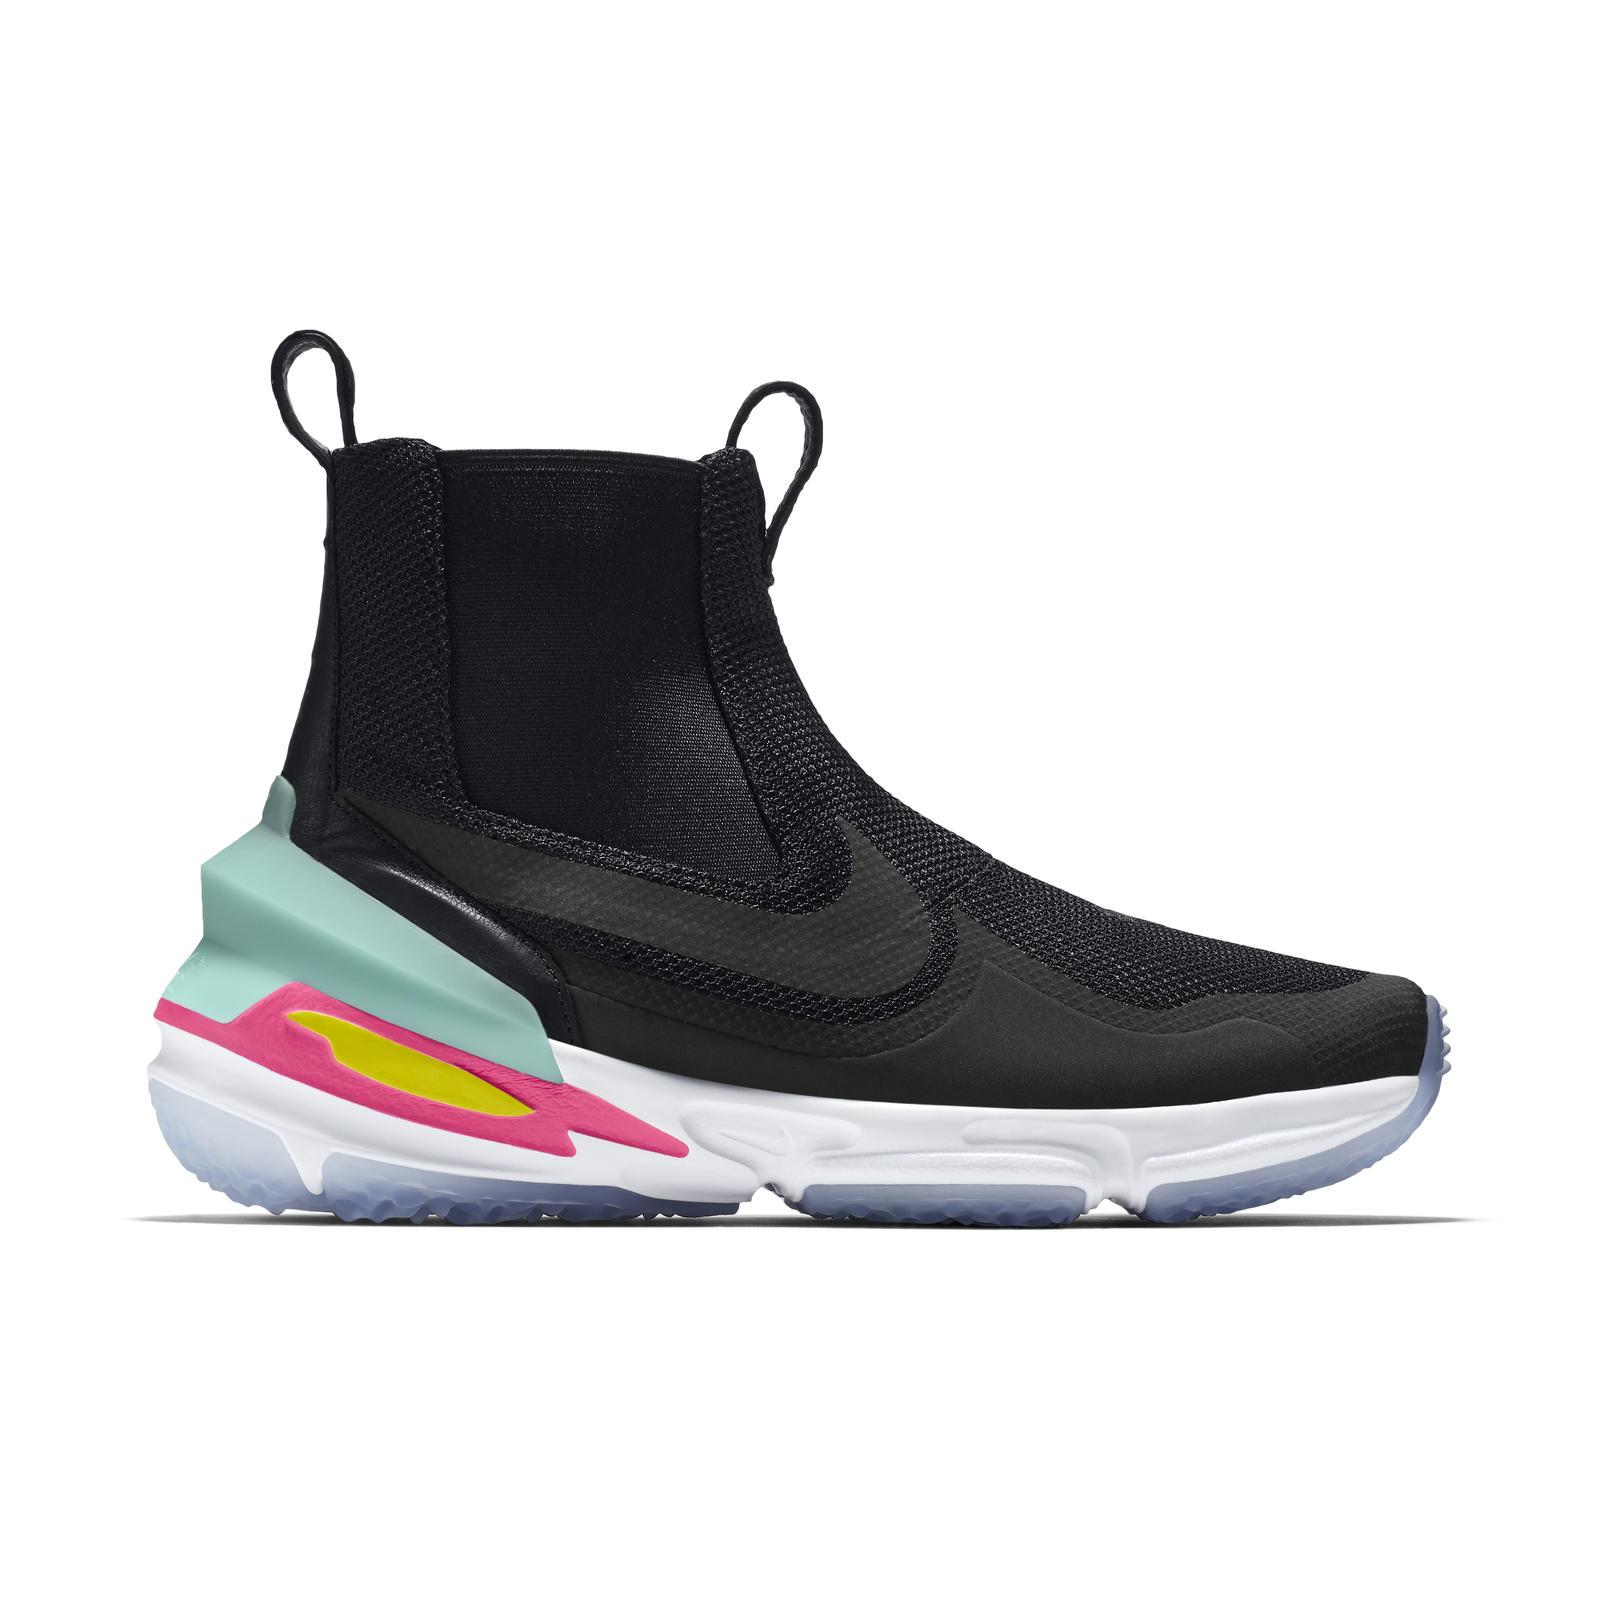 Nike Air Zoom Legend Basketball Shoes